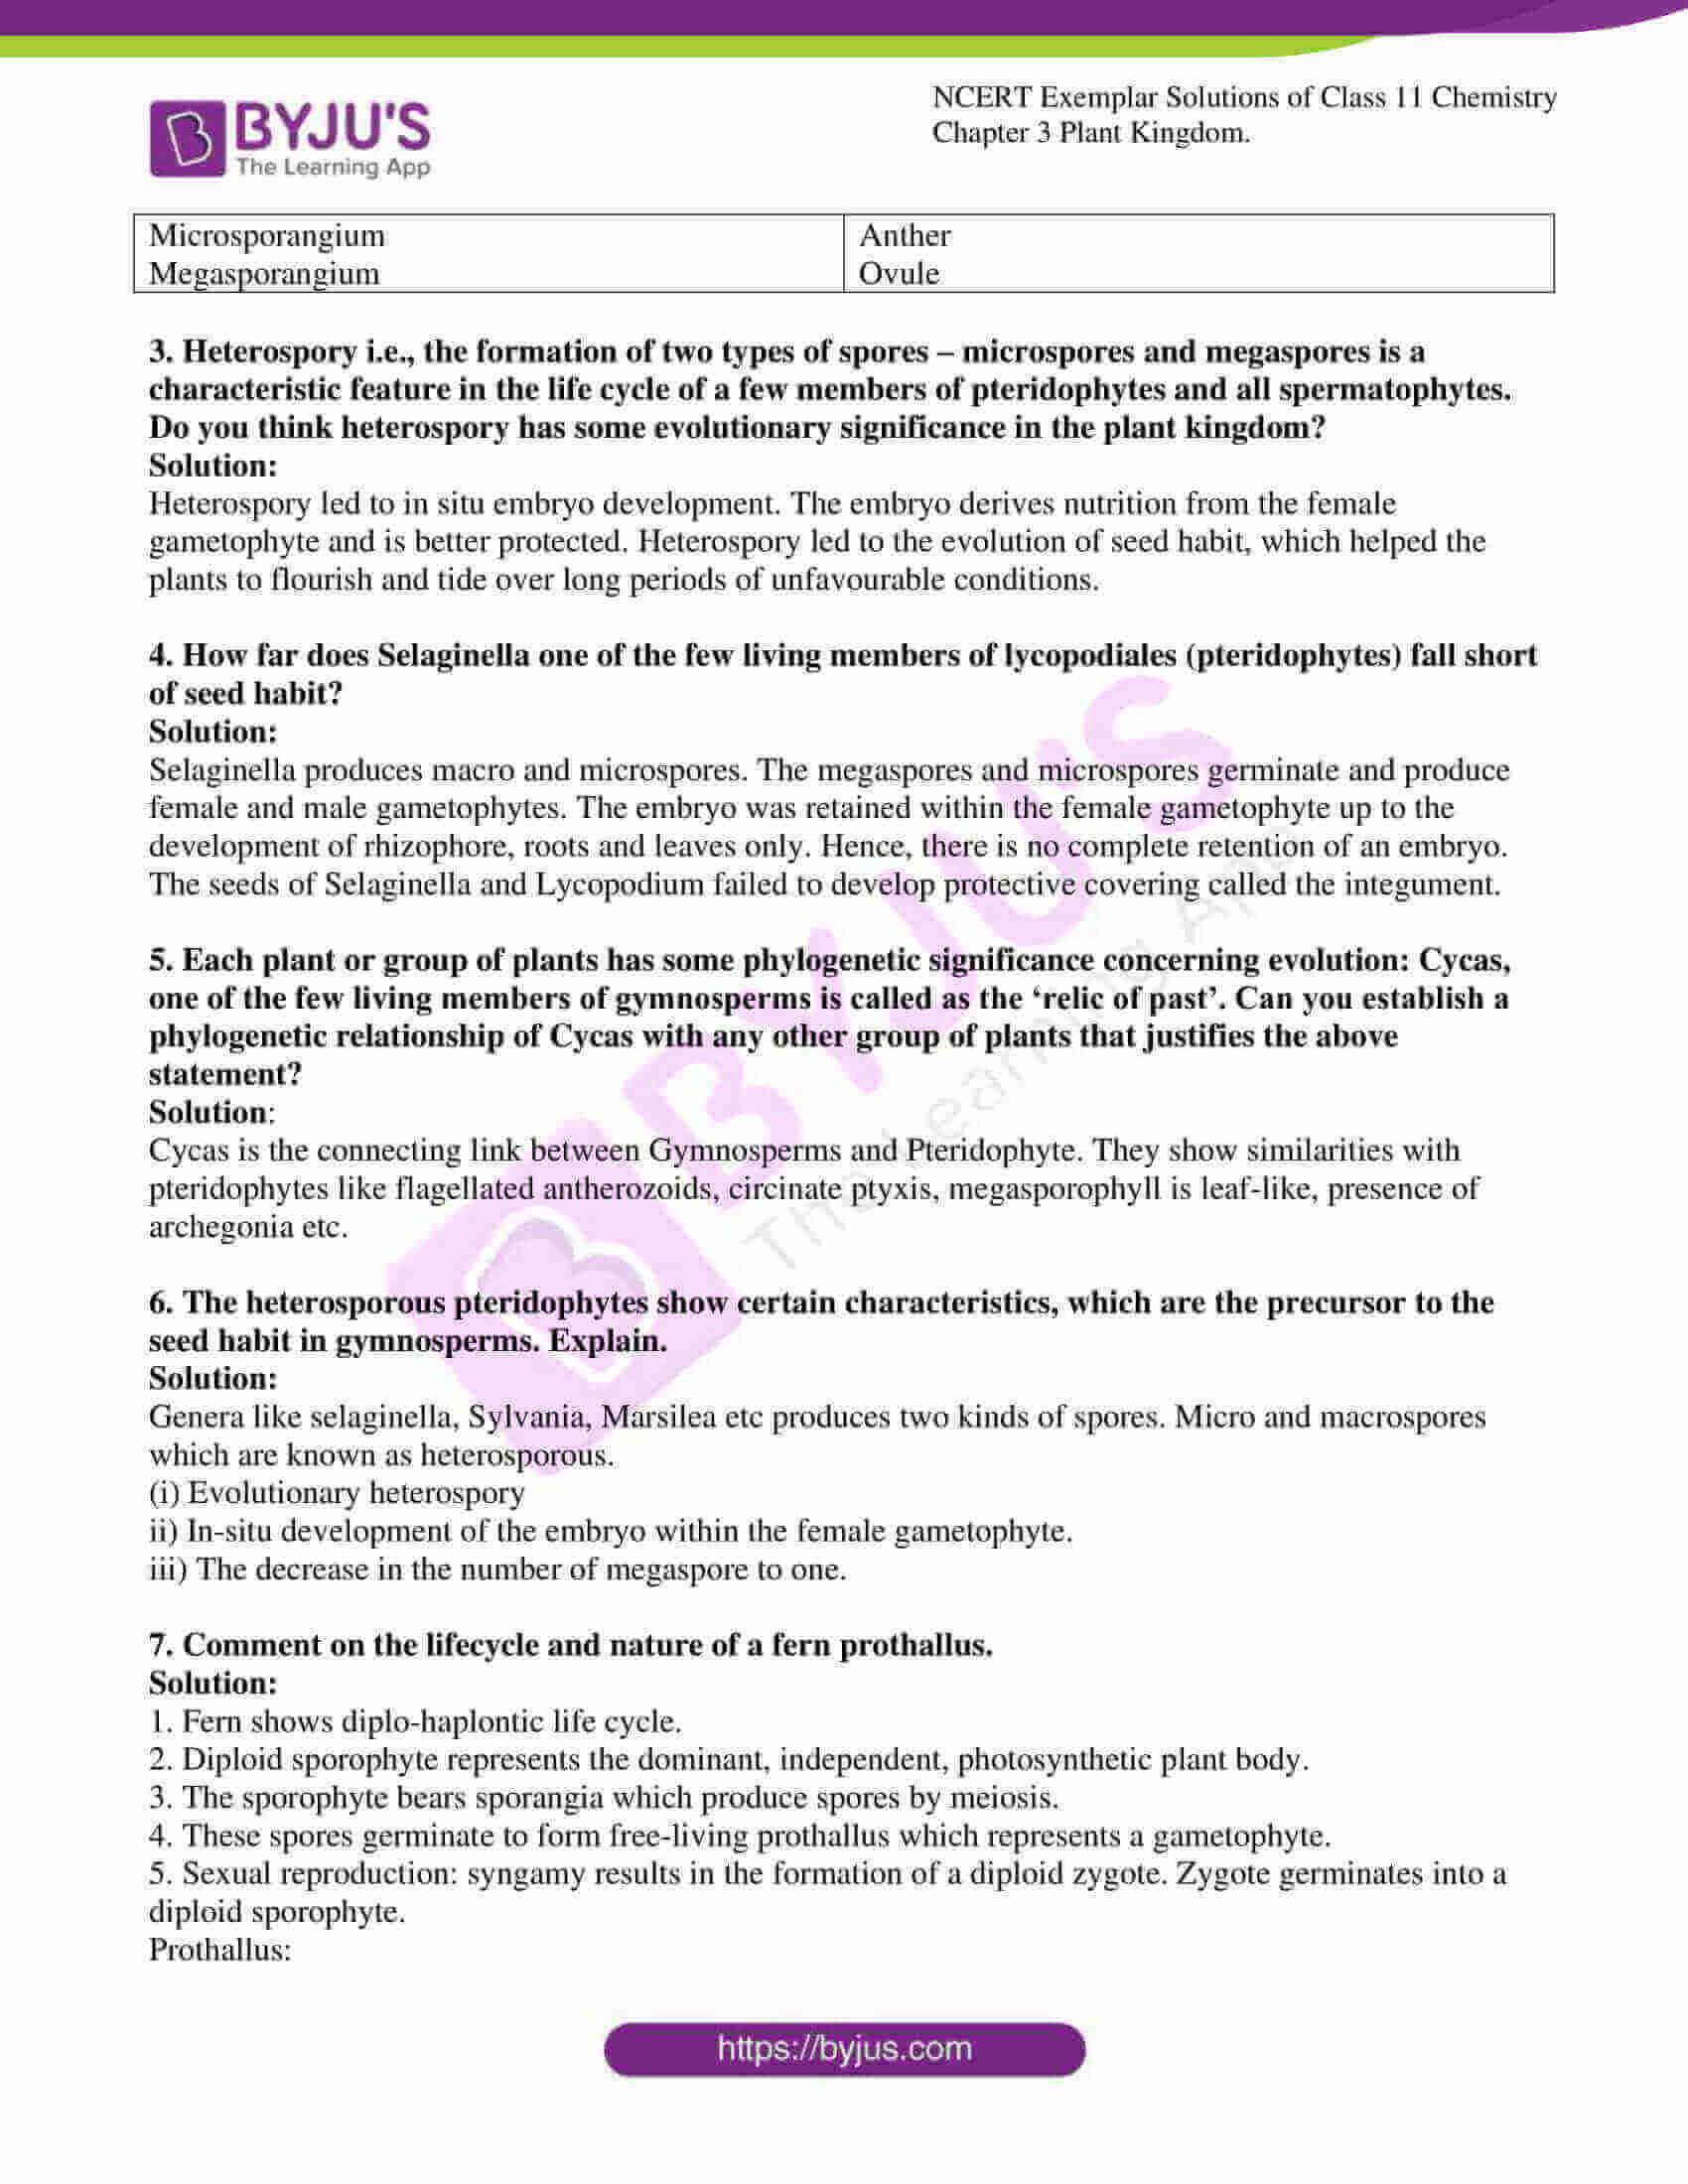 ncert exemplar solutions for class 11 bio chapter 3 4